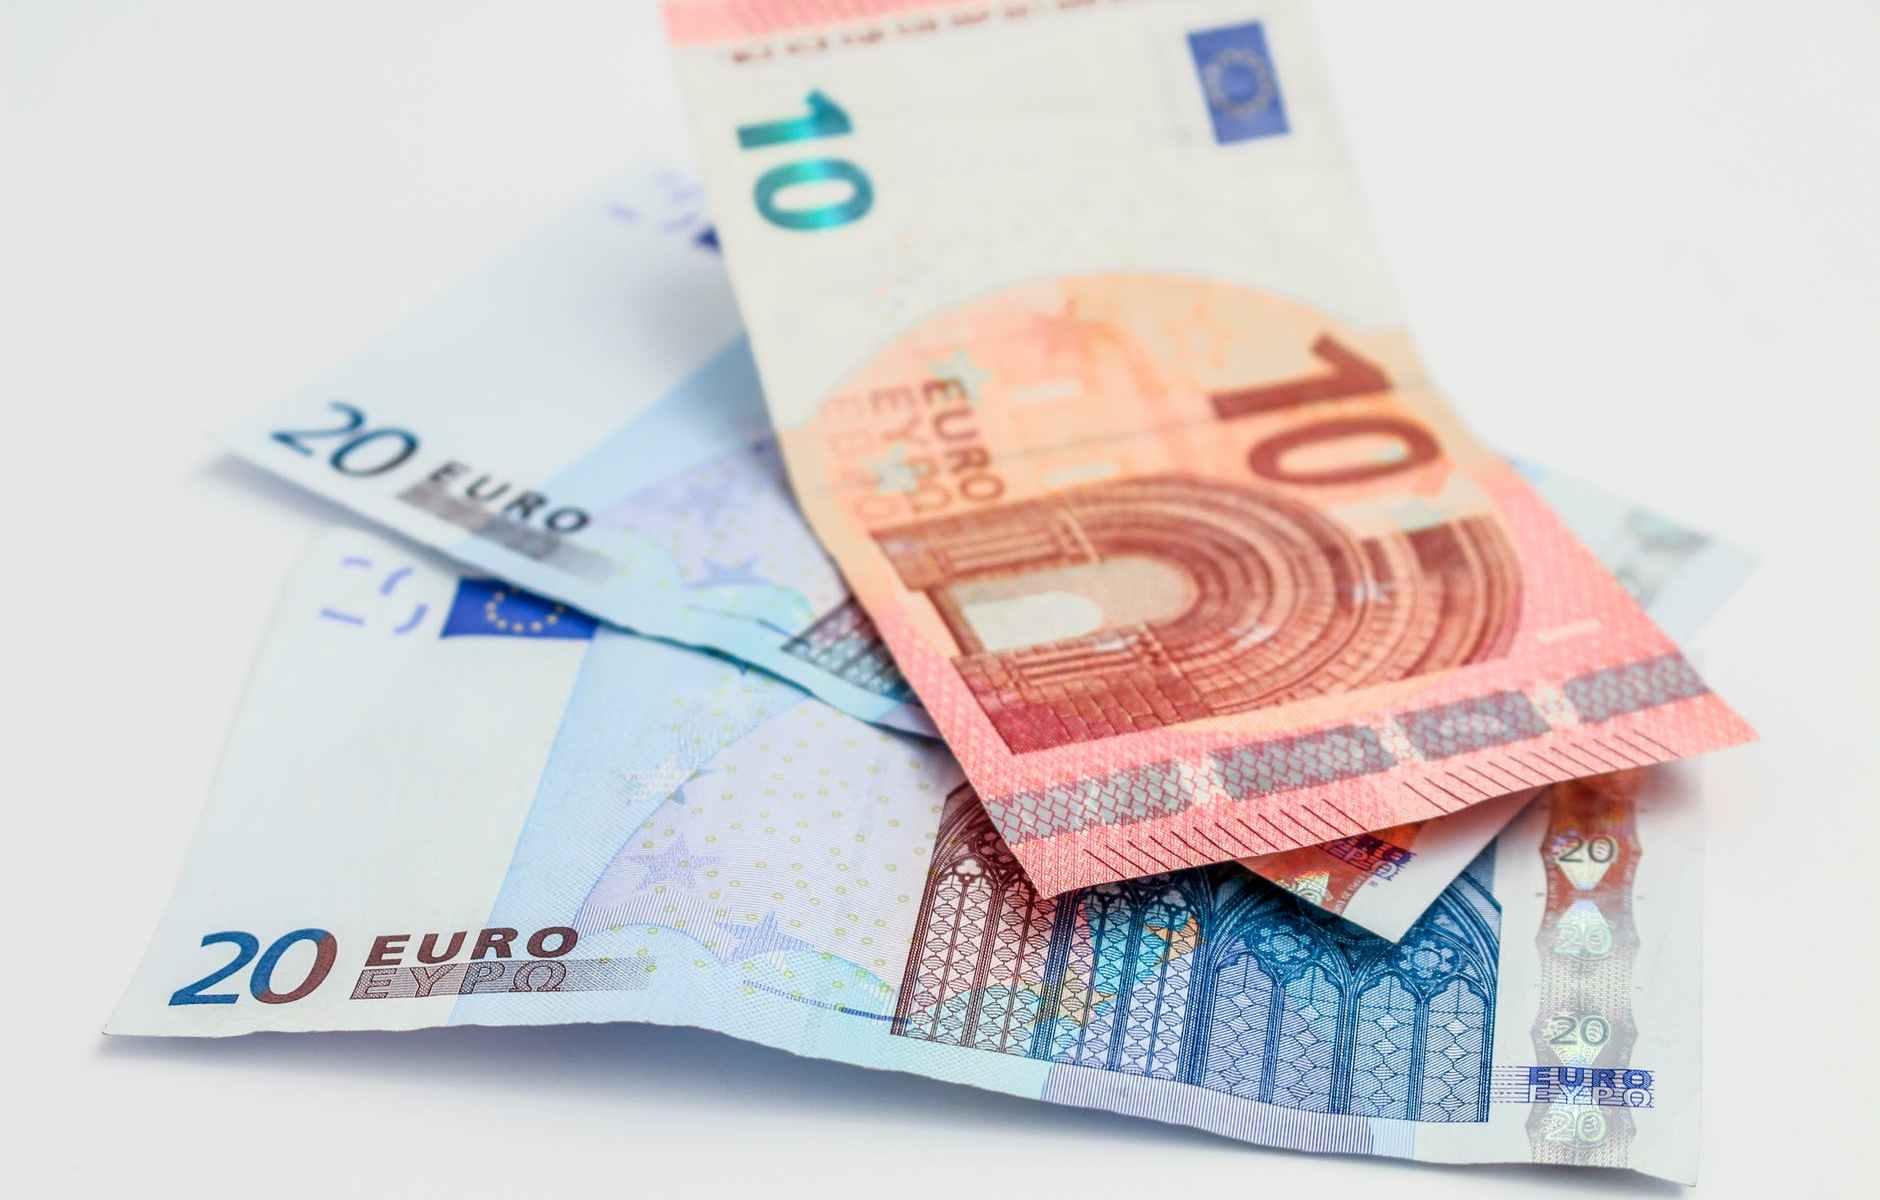 money-soldi-euro-banconote